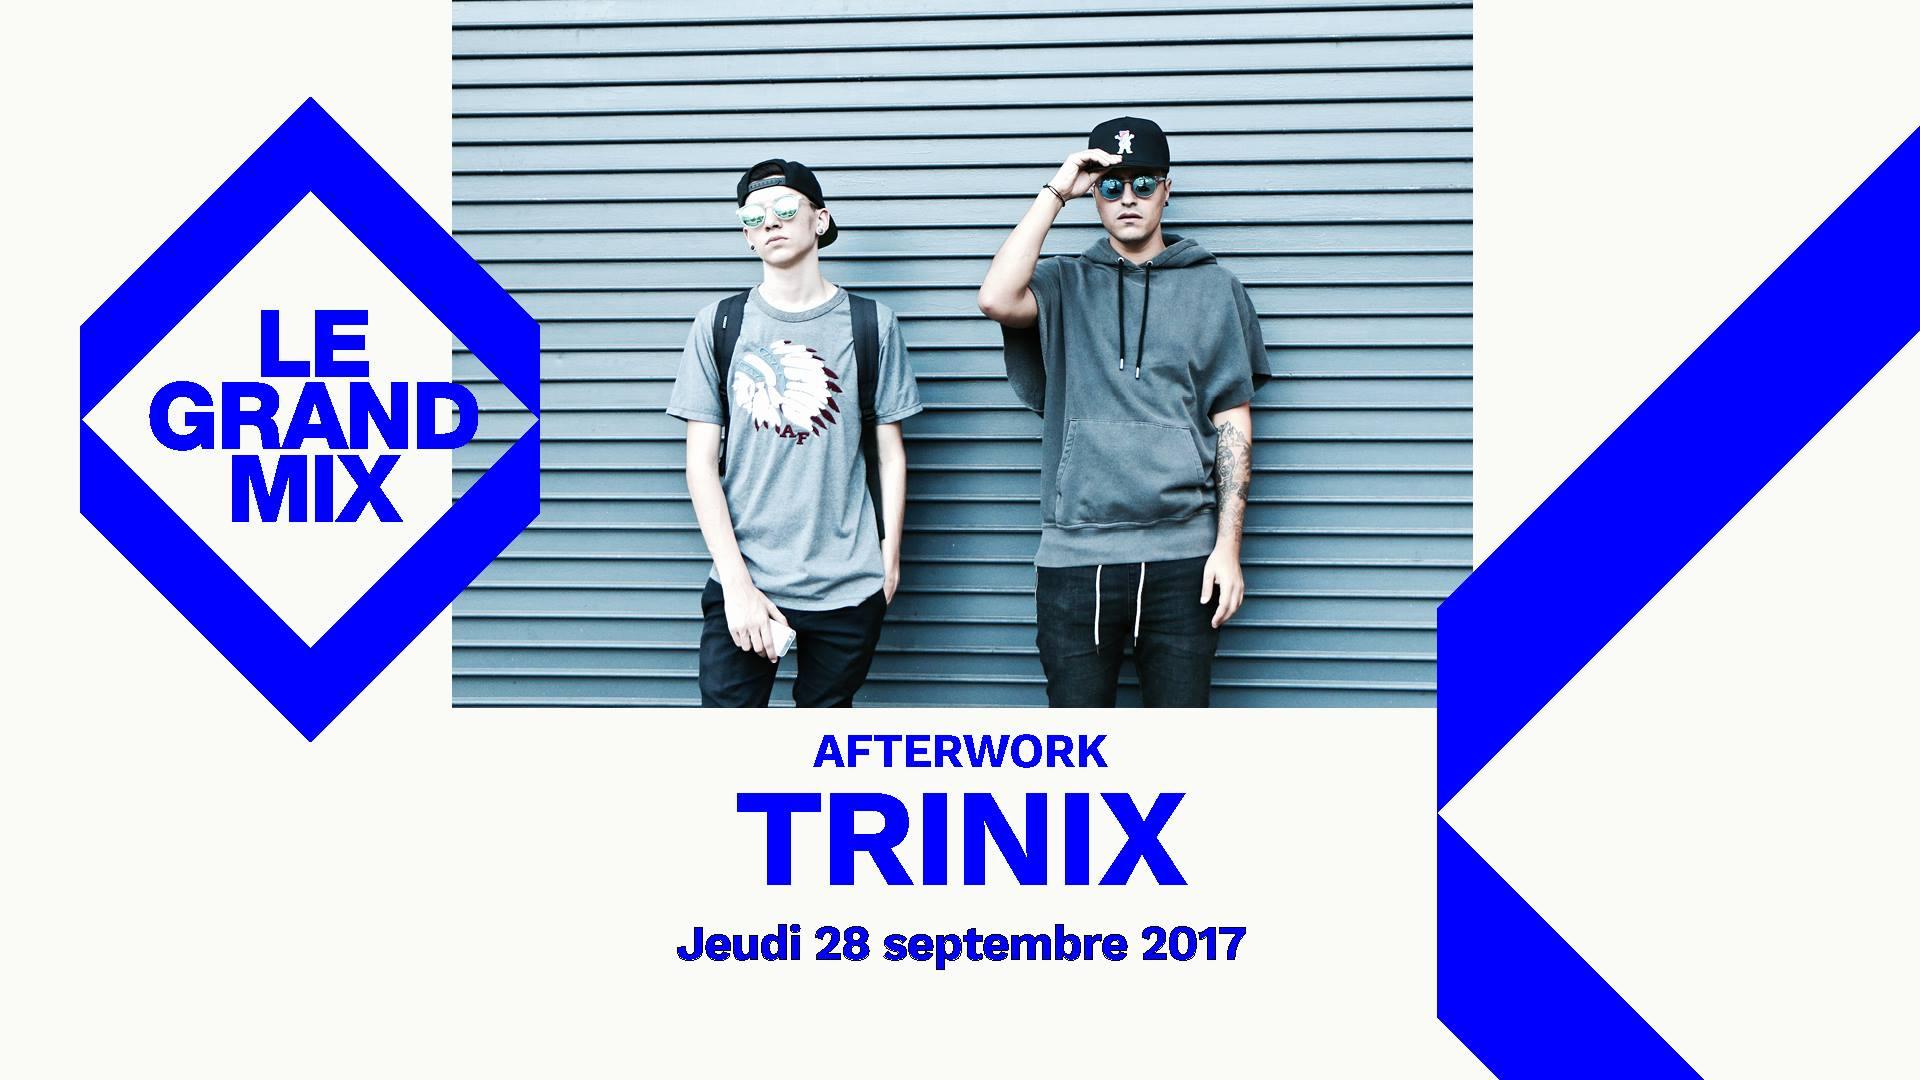 Afterwork avec Trinix